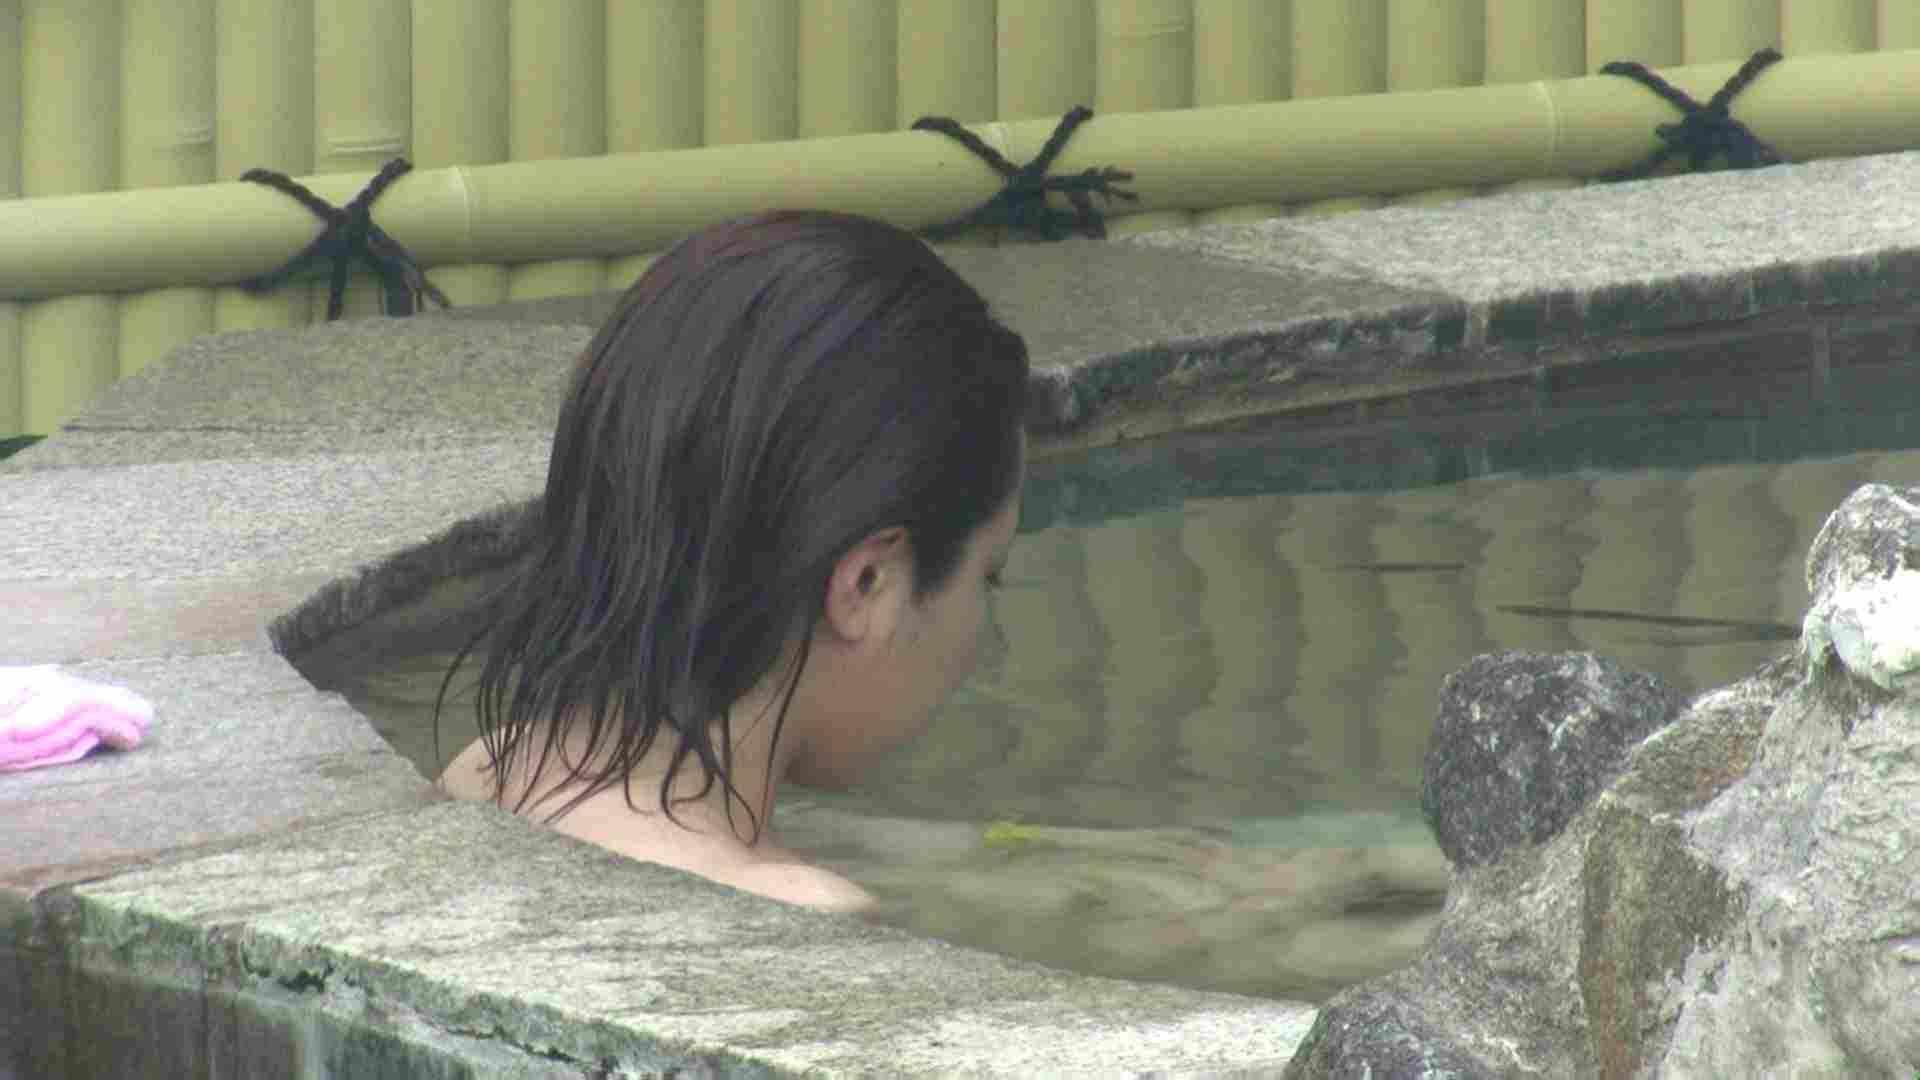 Aquaな露天風呂Vol.604 露天 | OL女体  67連発 43